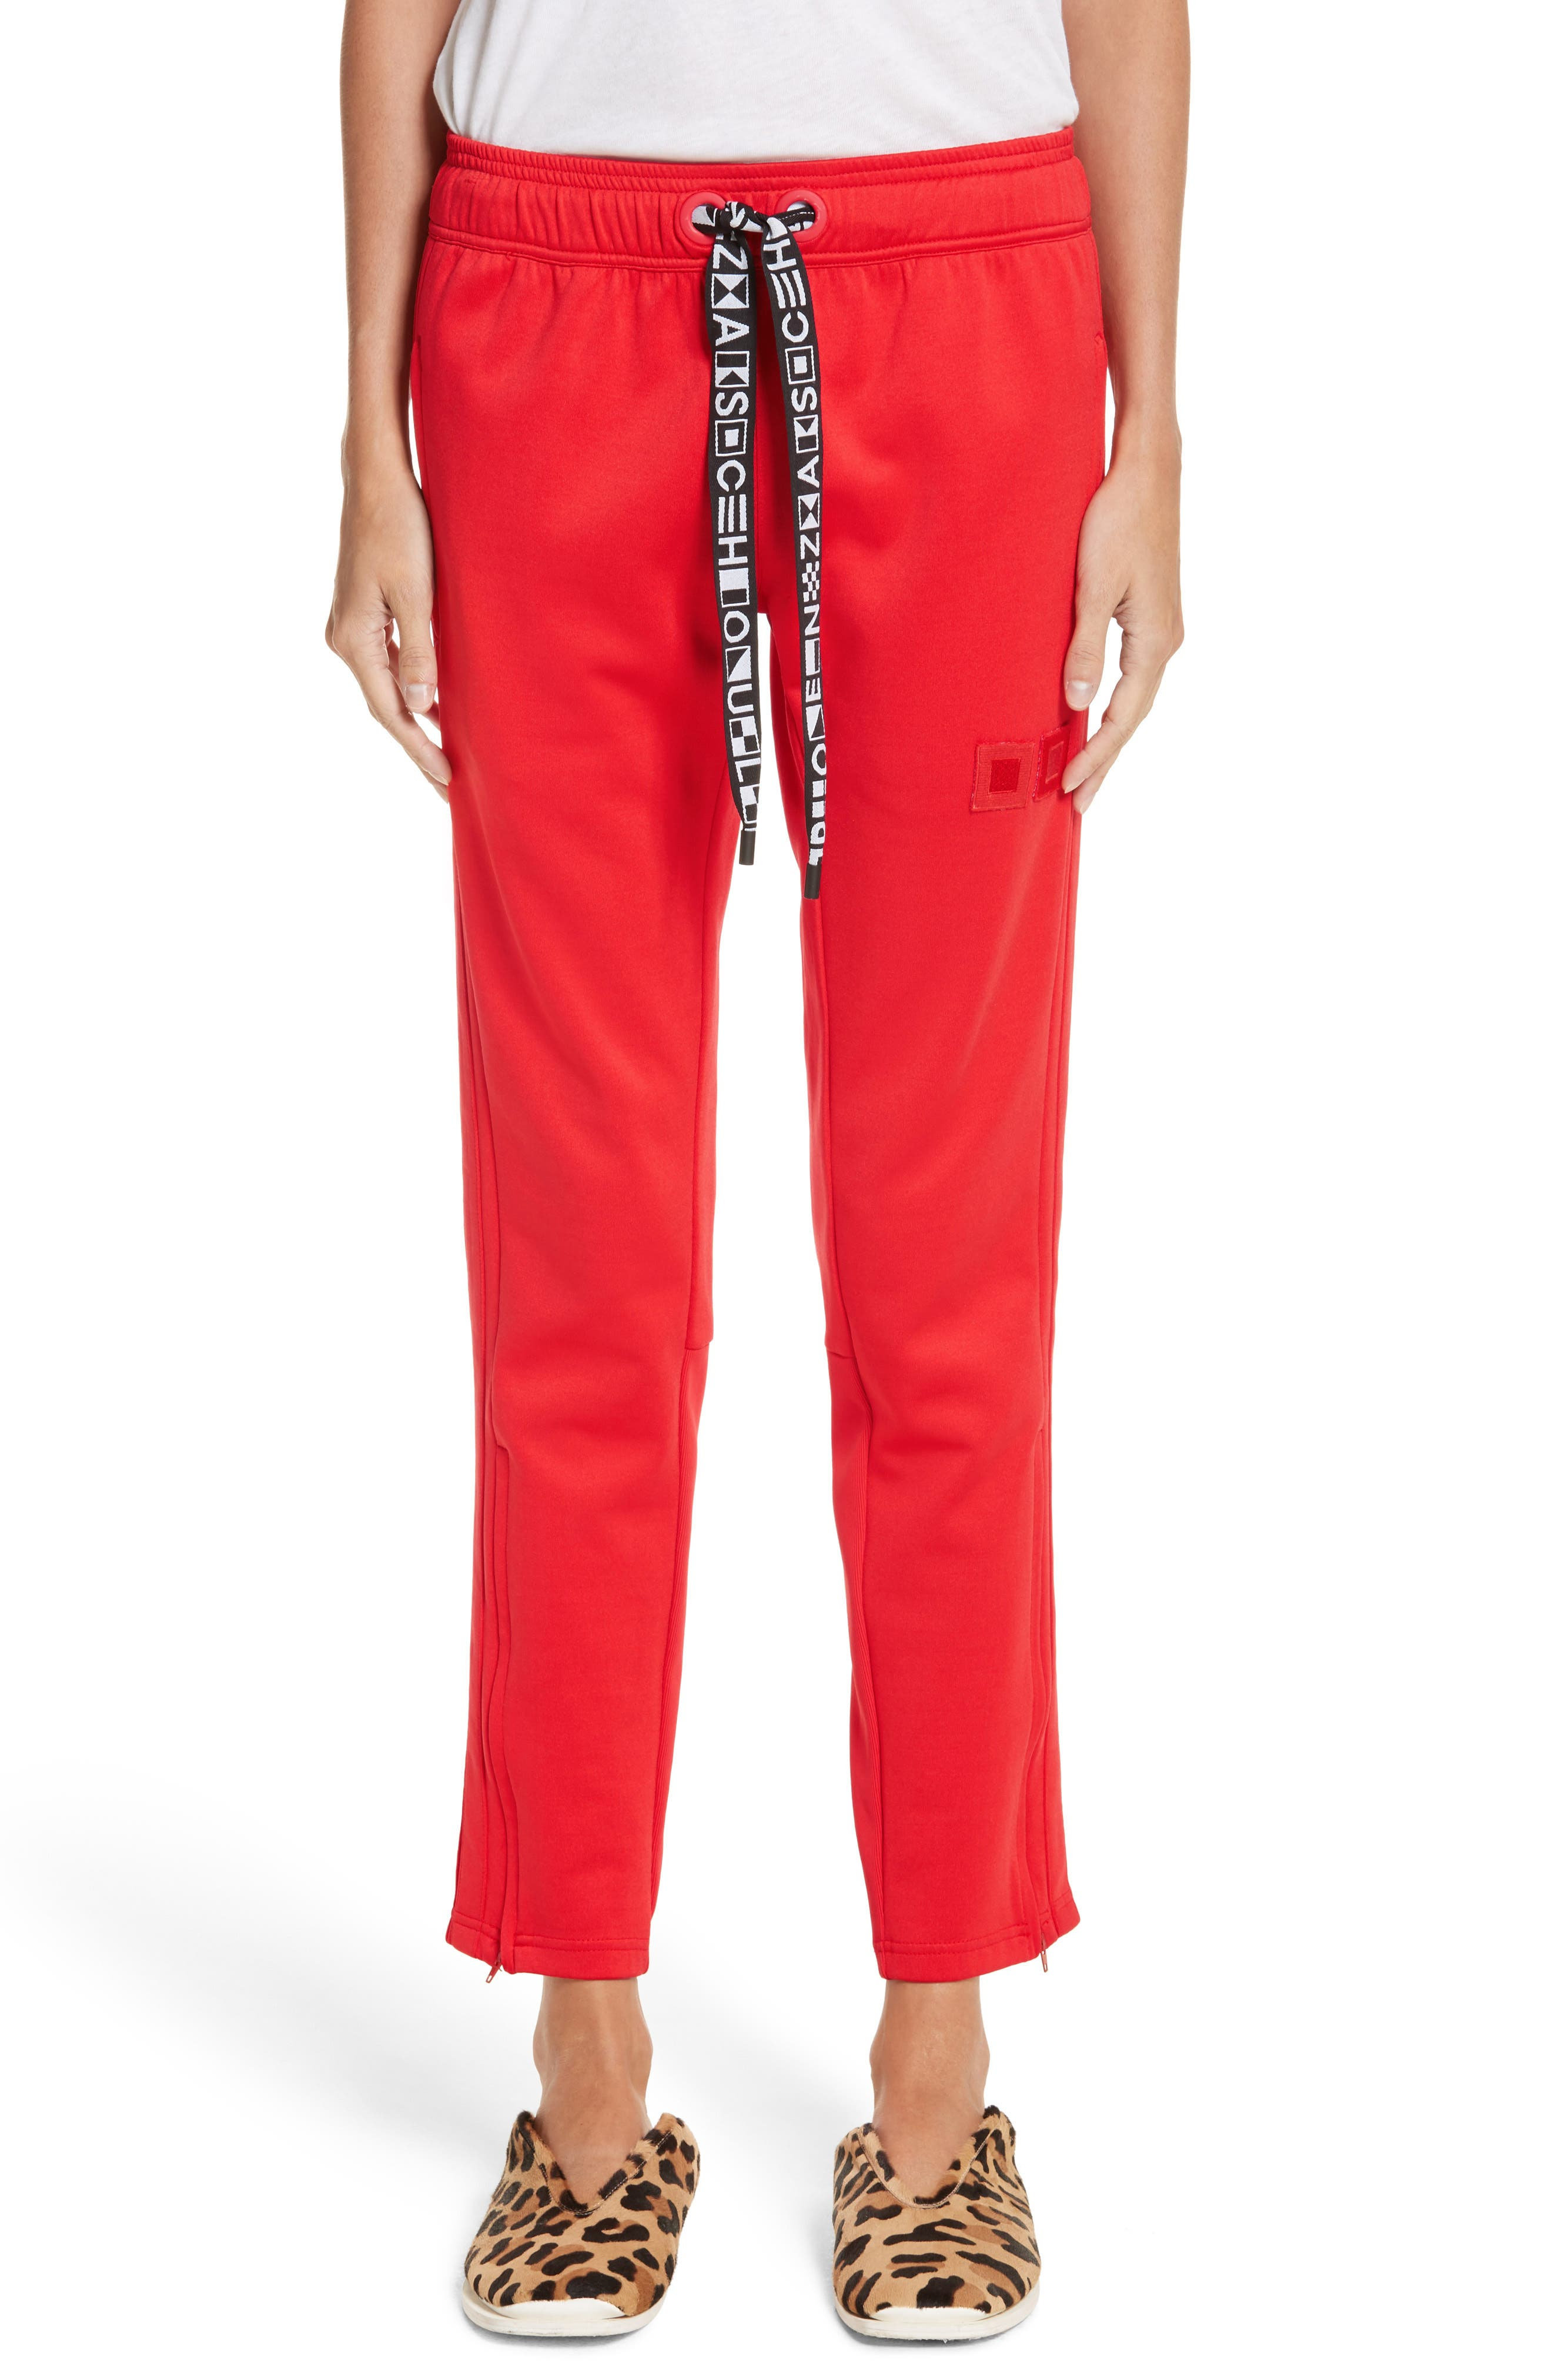 PSWL Jersey Track Pants,                             Main thumbnail 1, color,                             Poppy